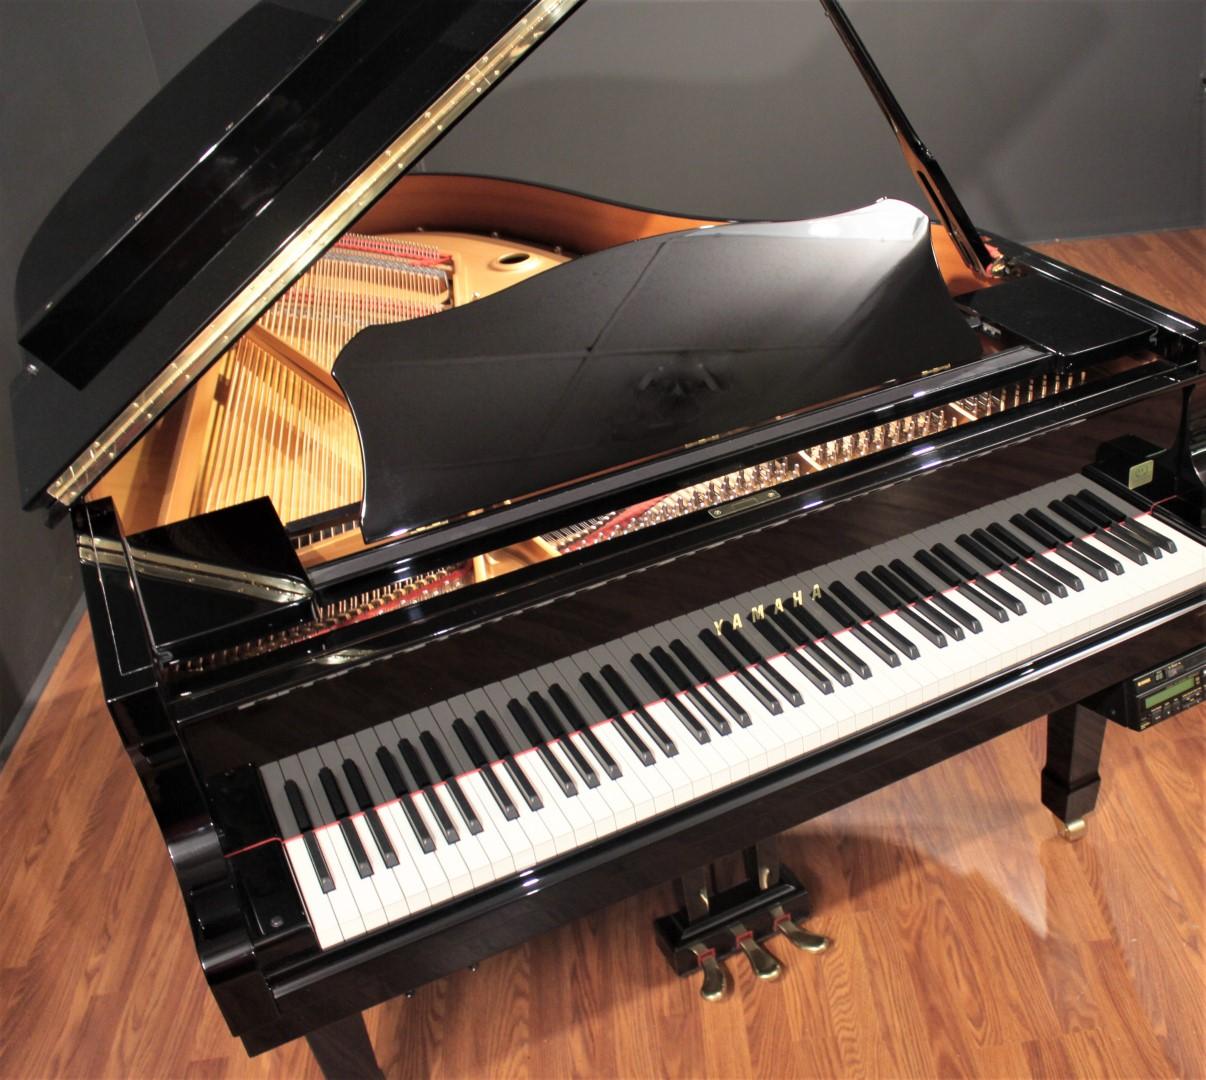 Yamaha disklavier c3 6 39 1 39 39 player grand piano 2000 grand for Yamaha disklavier grand piano